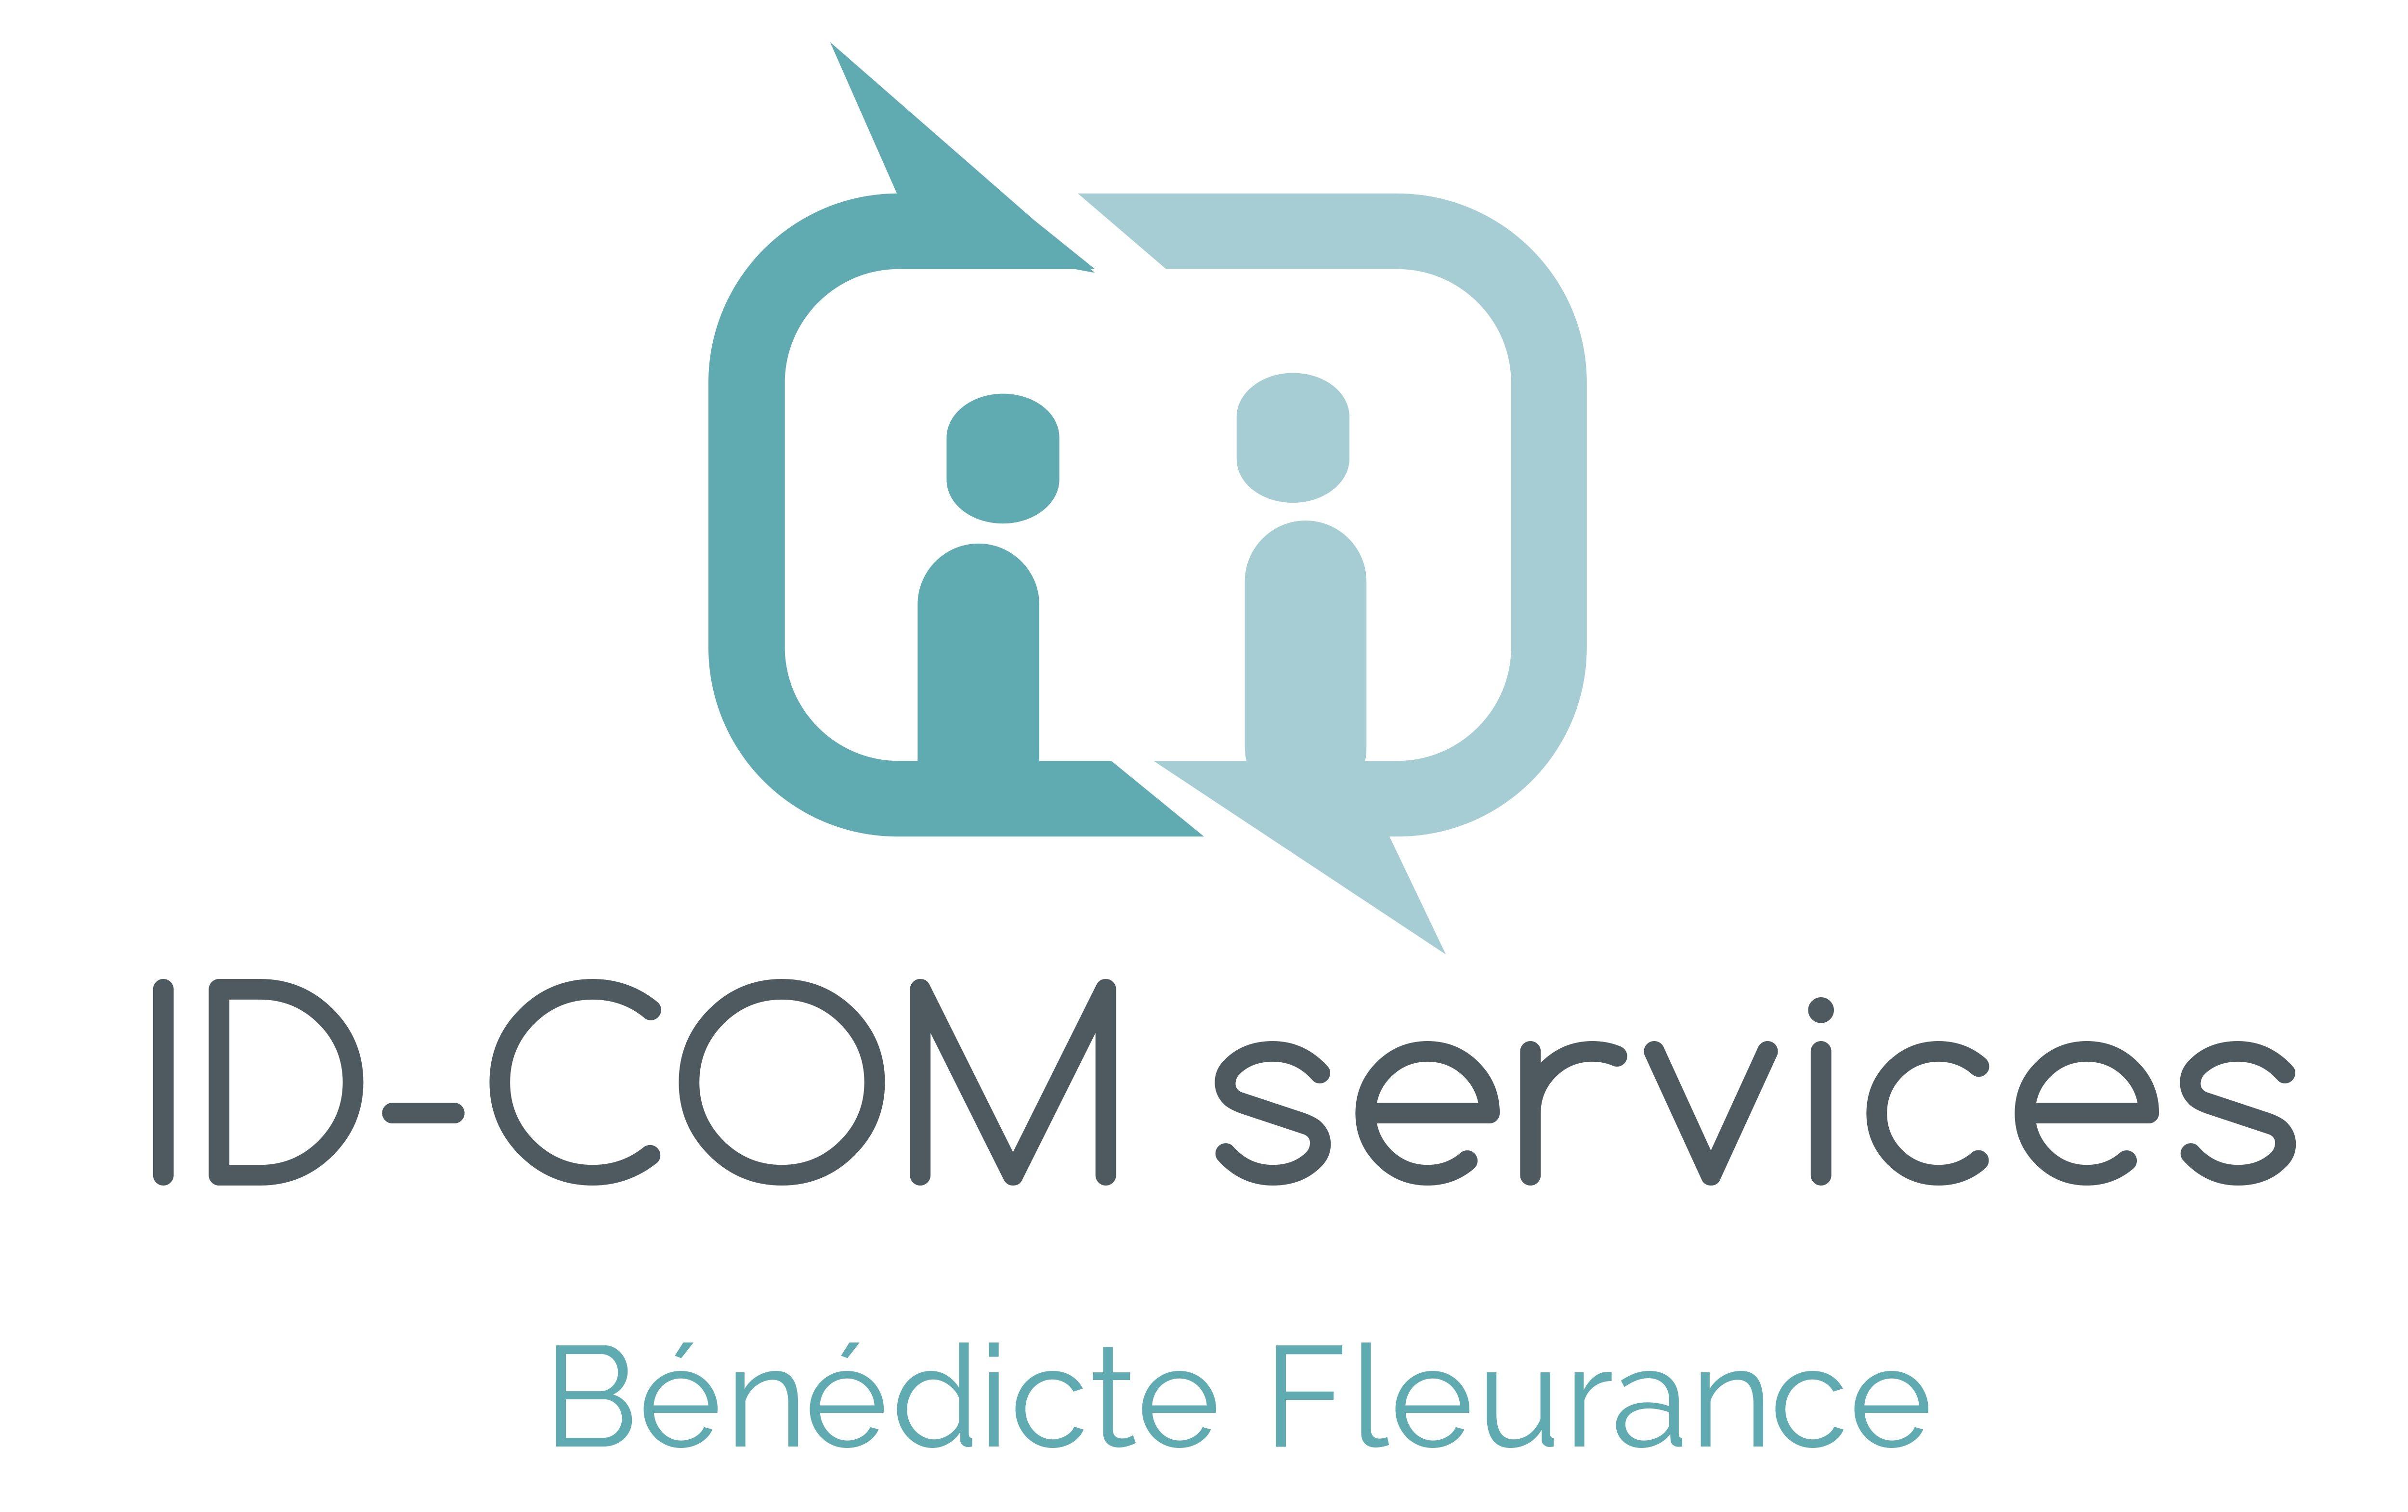 ID-COM services – Bénédicte Fleurance